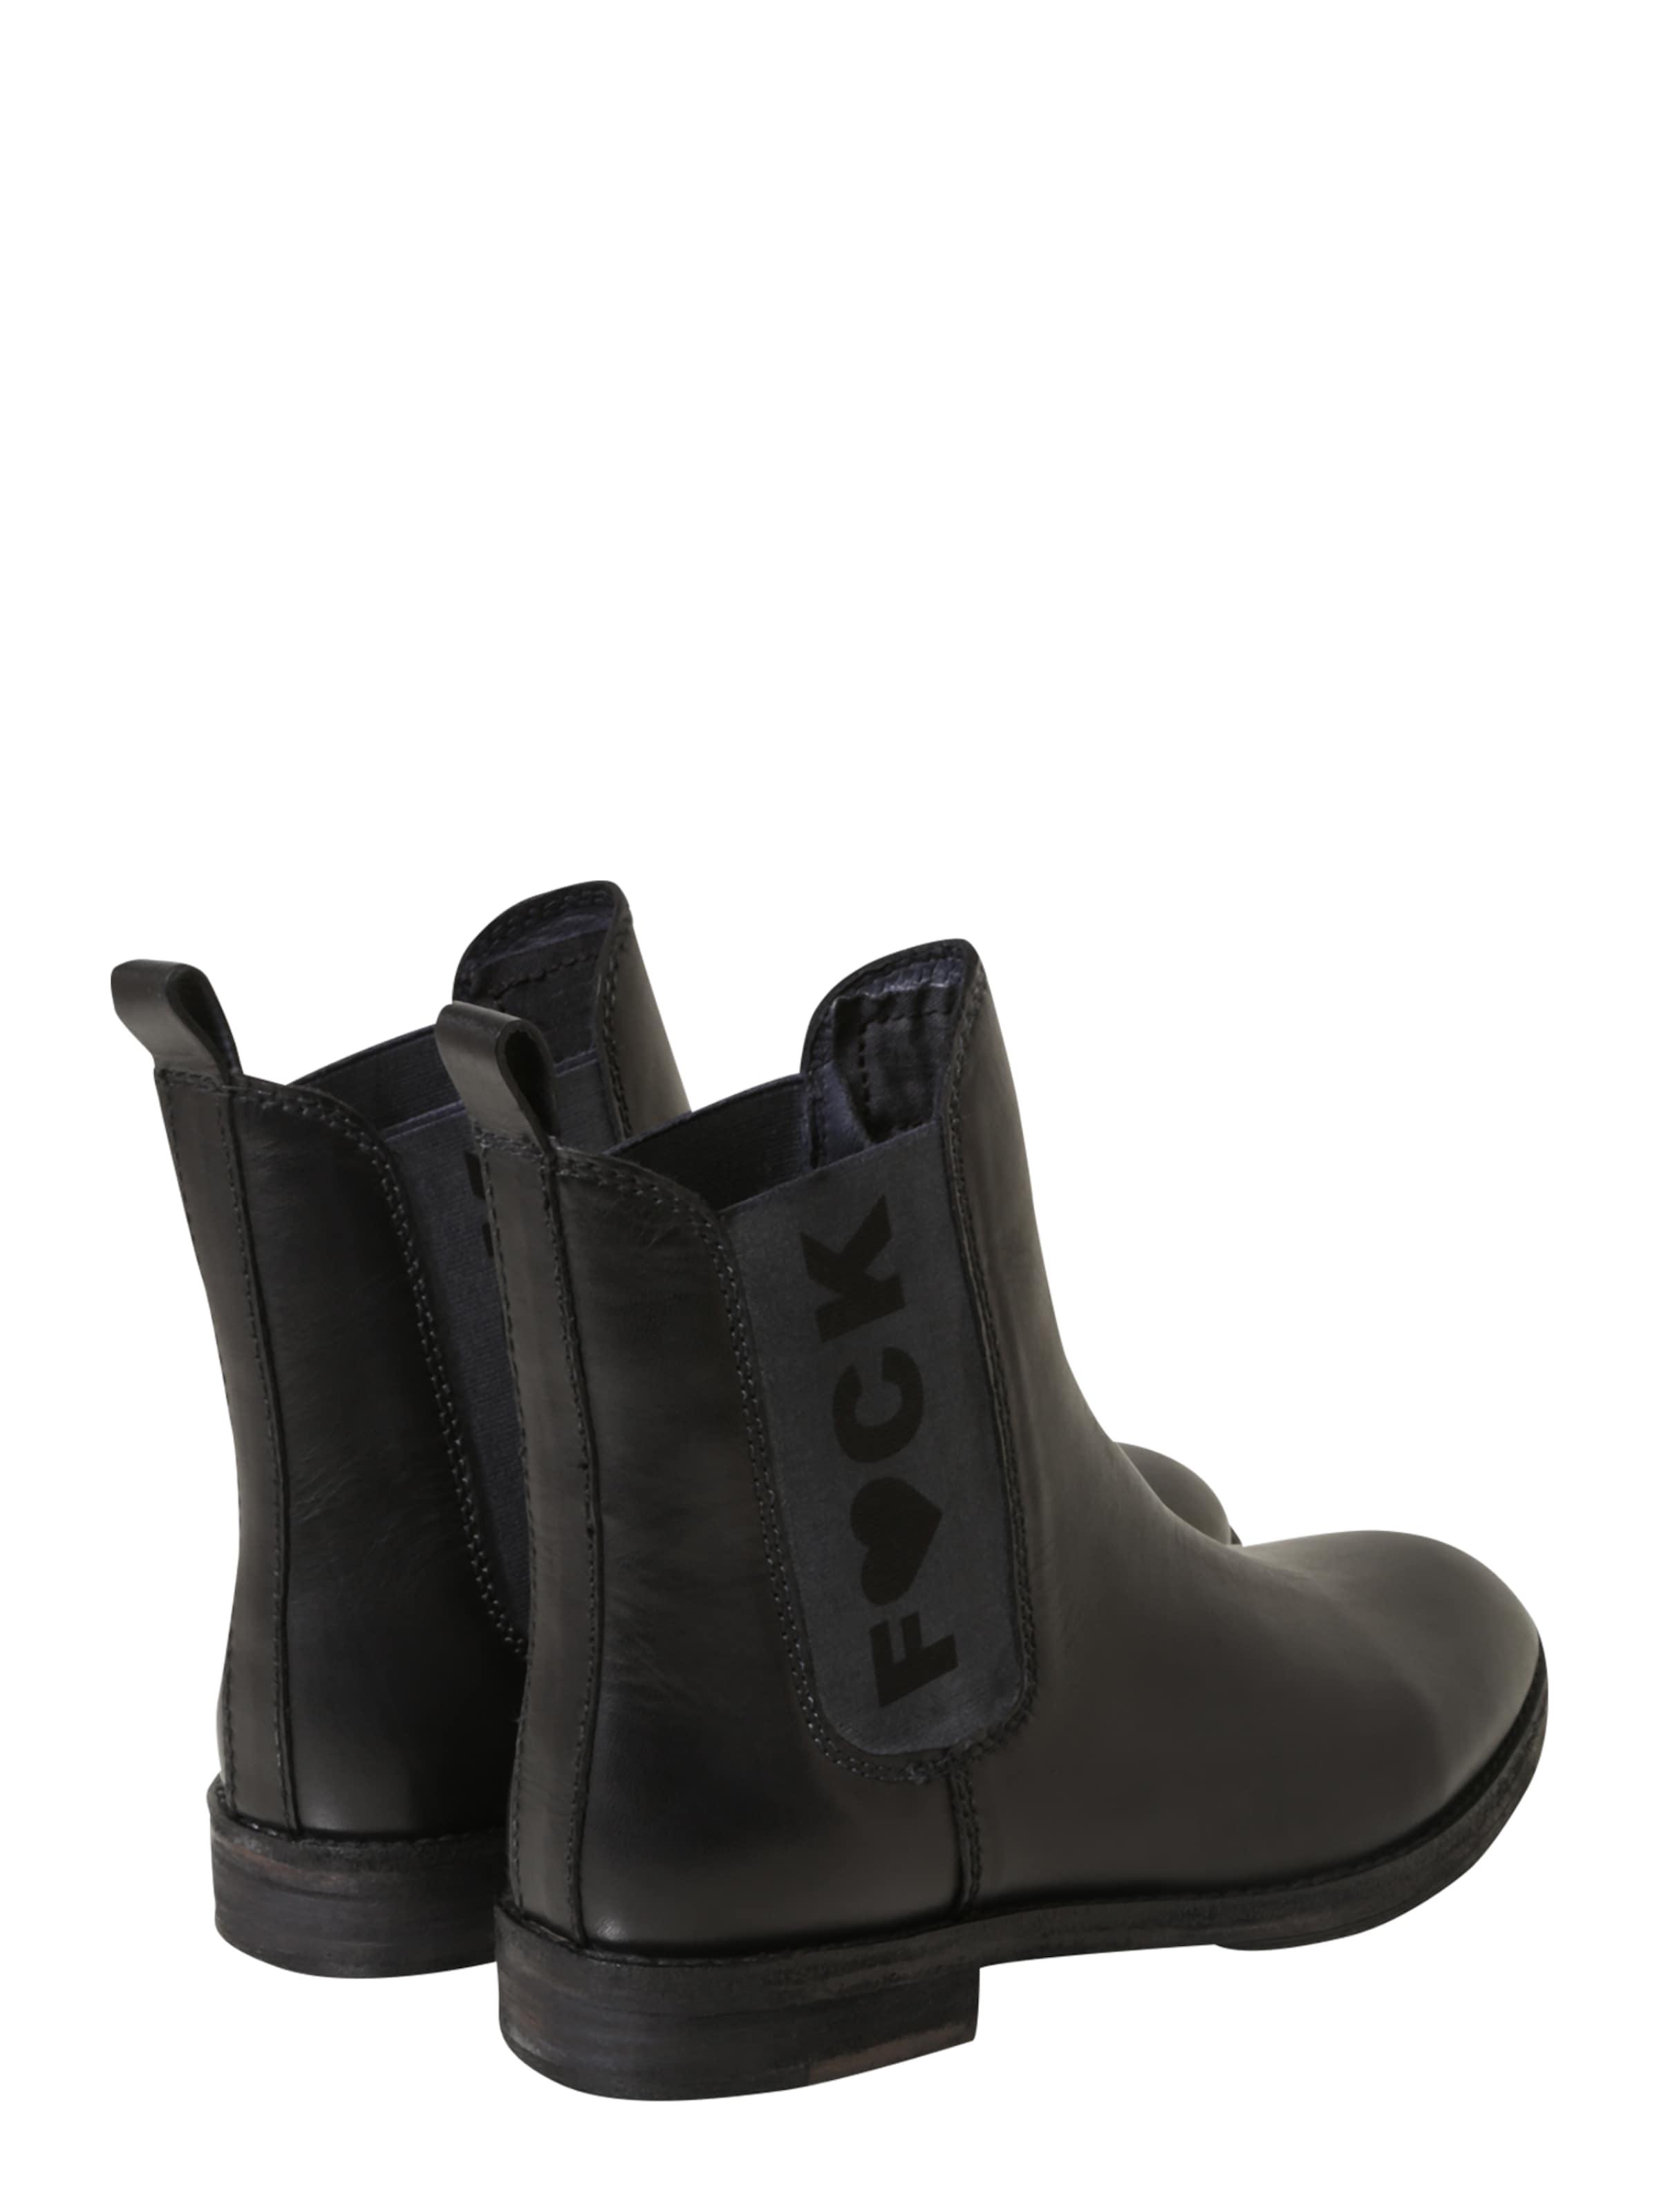 Noir Chelsea Thomas For Boots Hayo 'houston' En Crickit MqzpGSUV